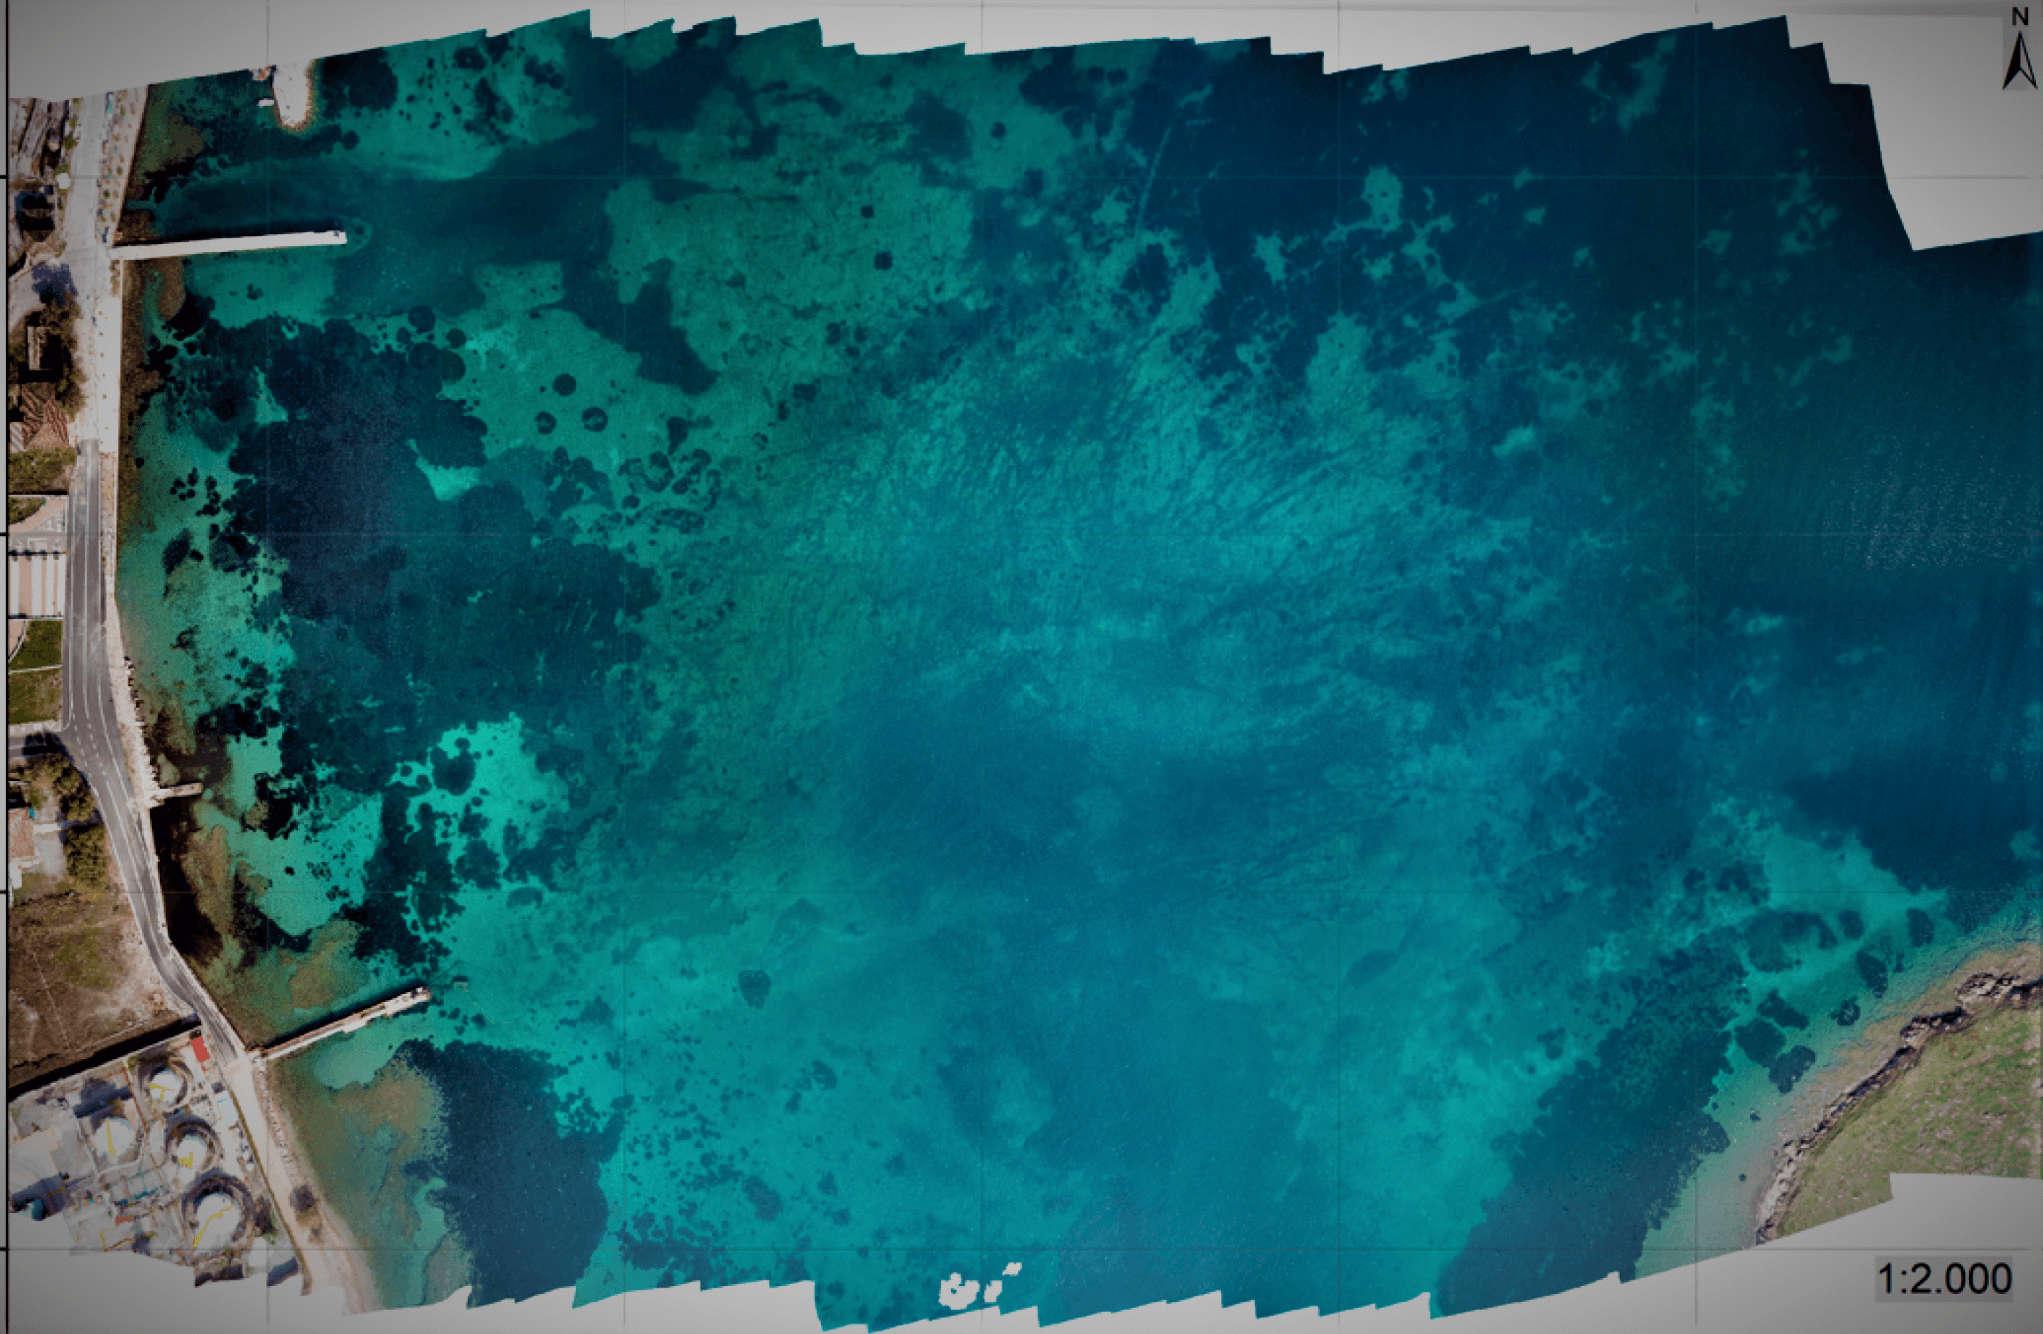 RGB Orthomosaic Map | Drones for Marine Monitoring | Marine Surveillance